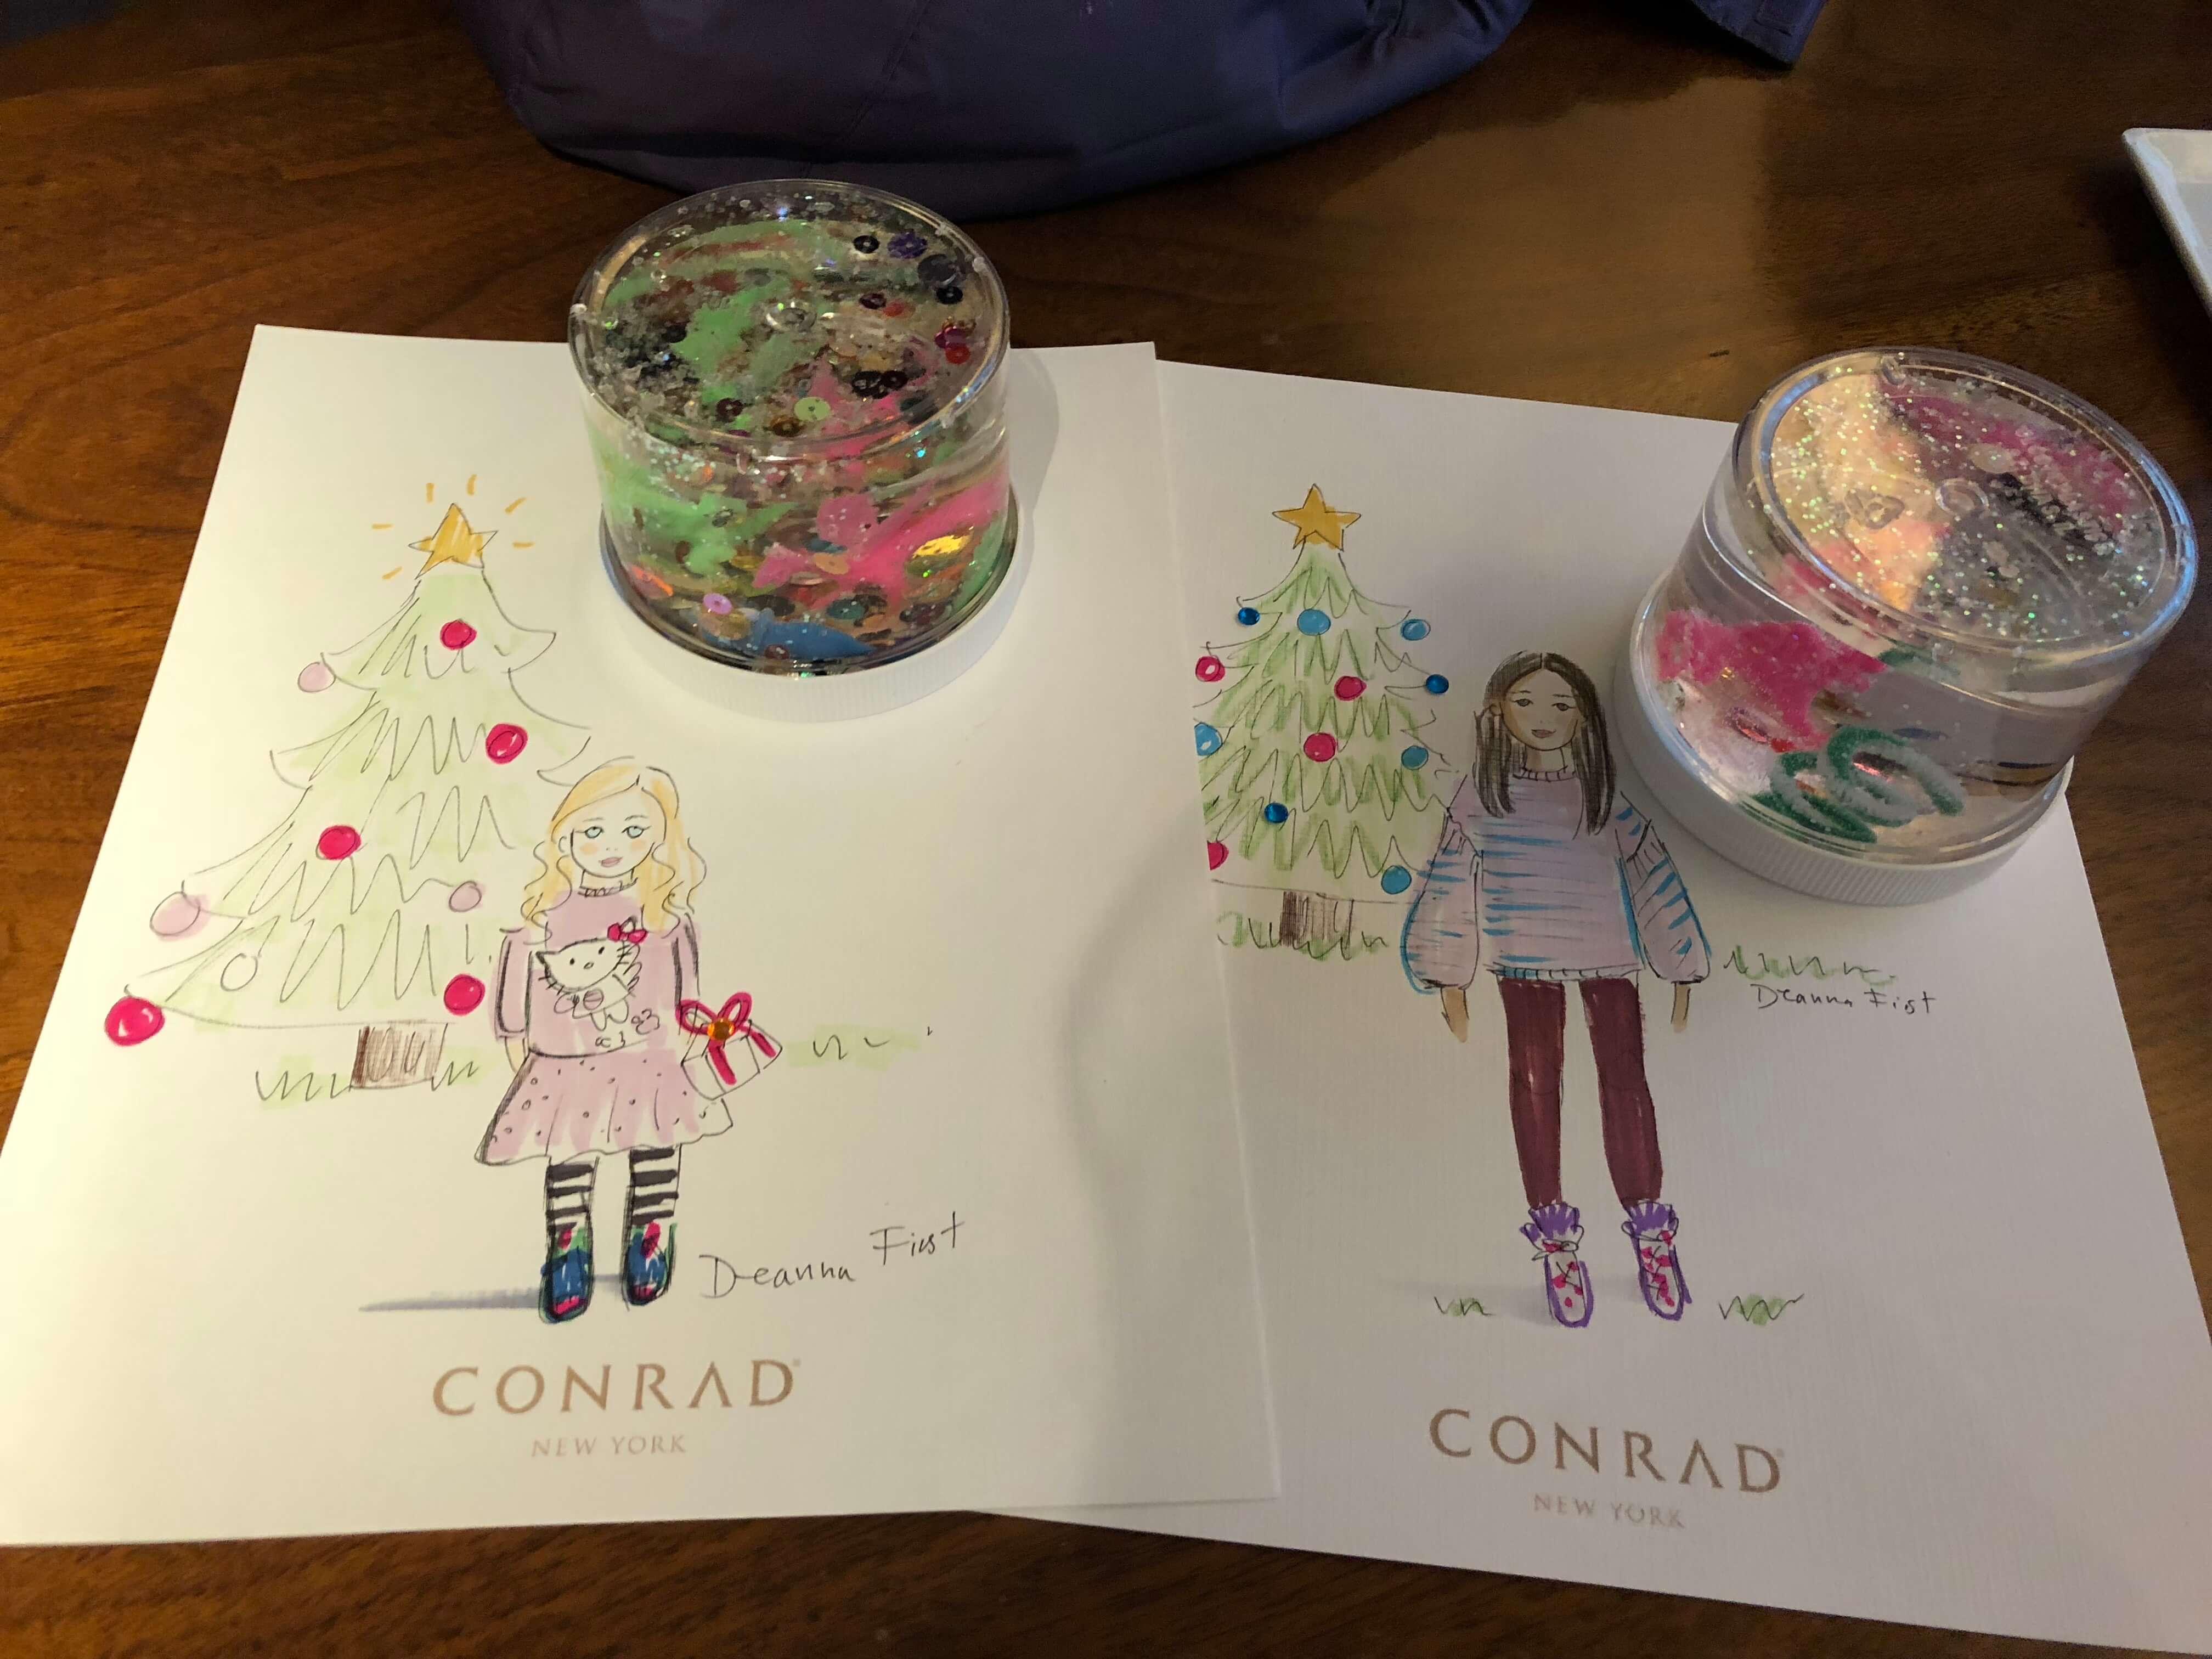 holiday fun at the conrad new york holiday event